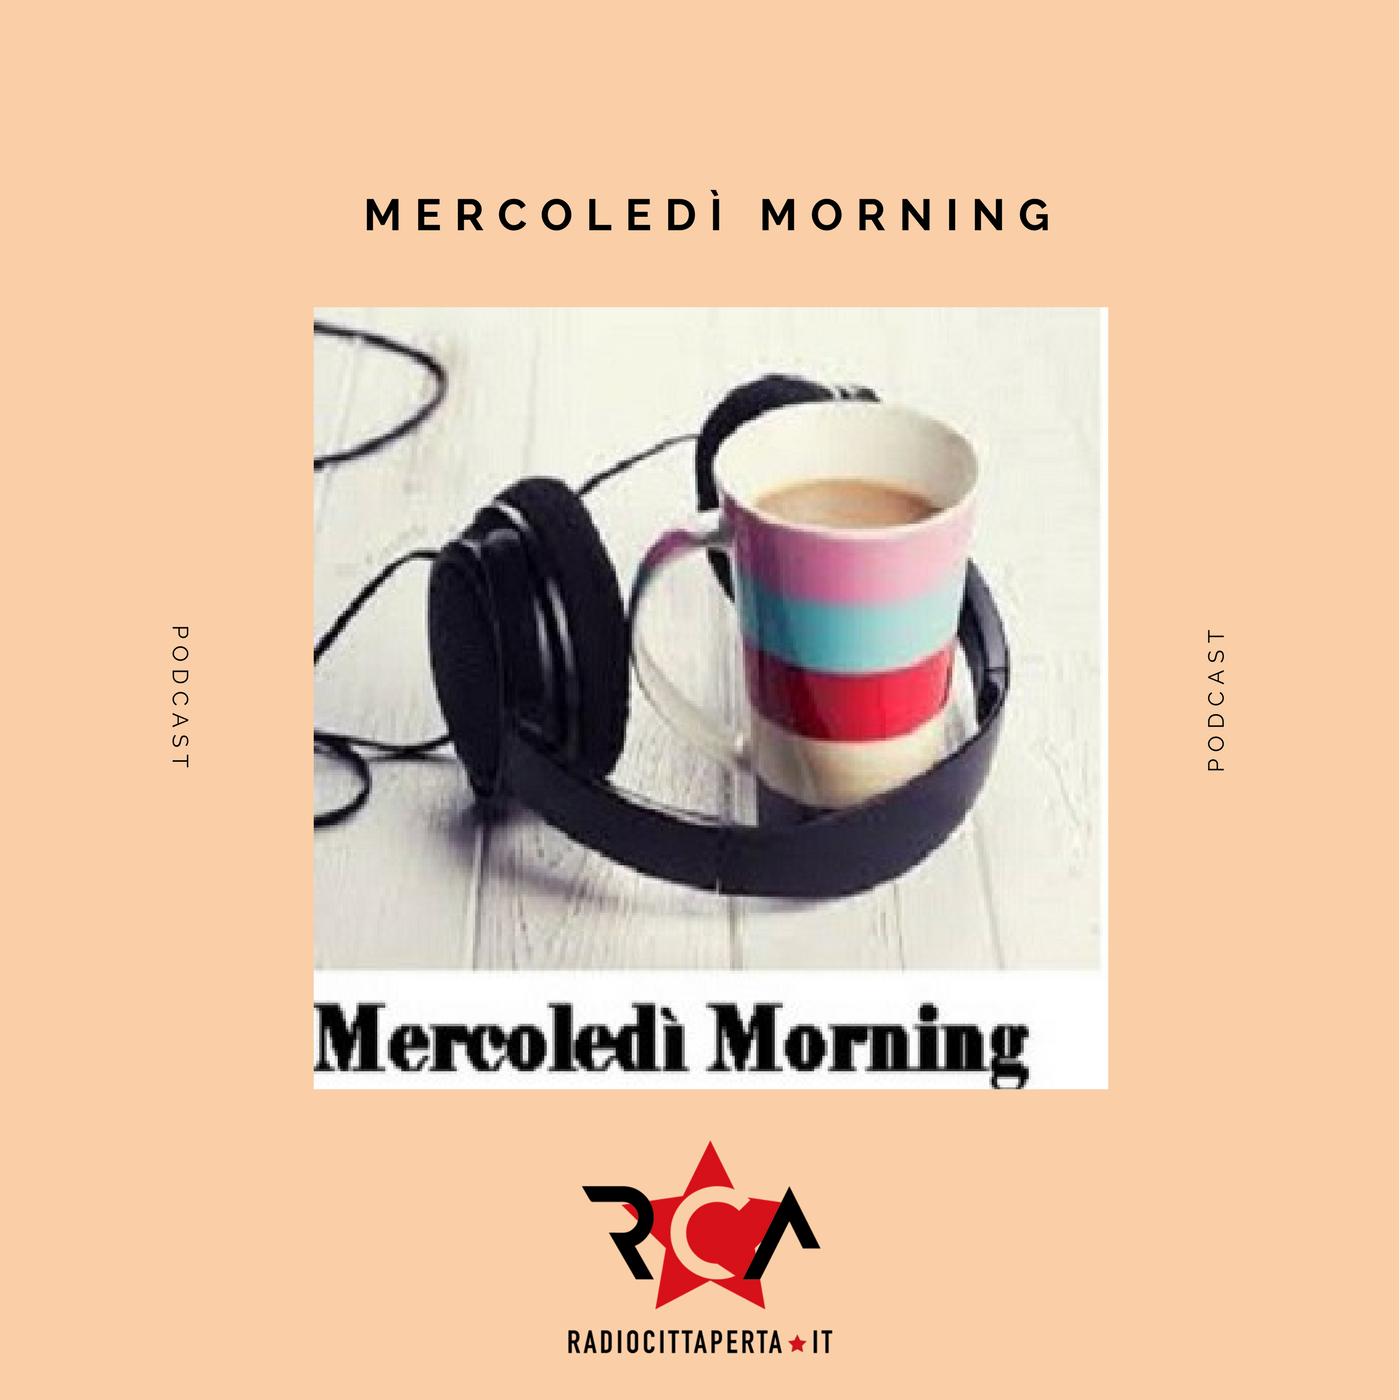 MERCOLEDI' MORNING con GIANLUCA POLVERARI